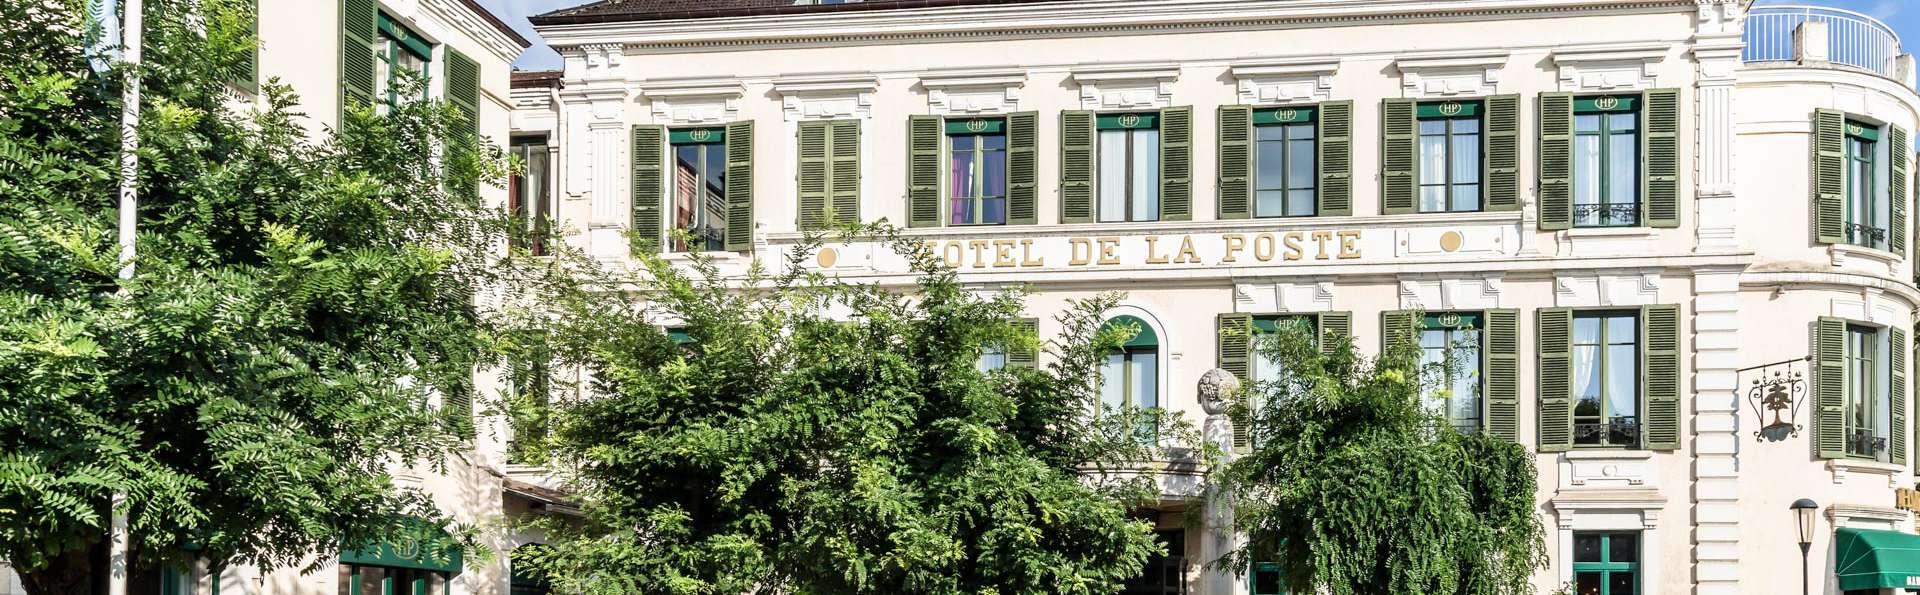 Najeti Hôtel de la Poste  - EDIT_FRONT_02.jpg